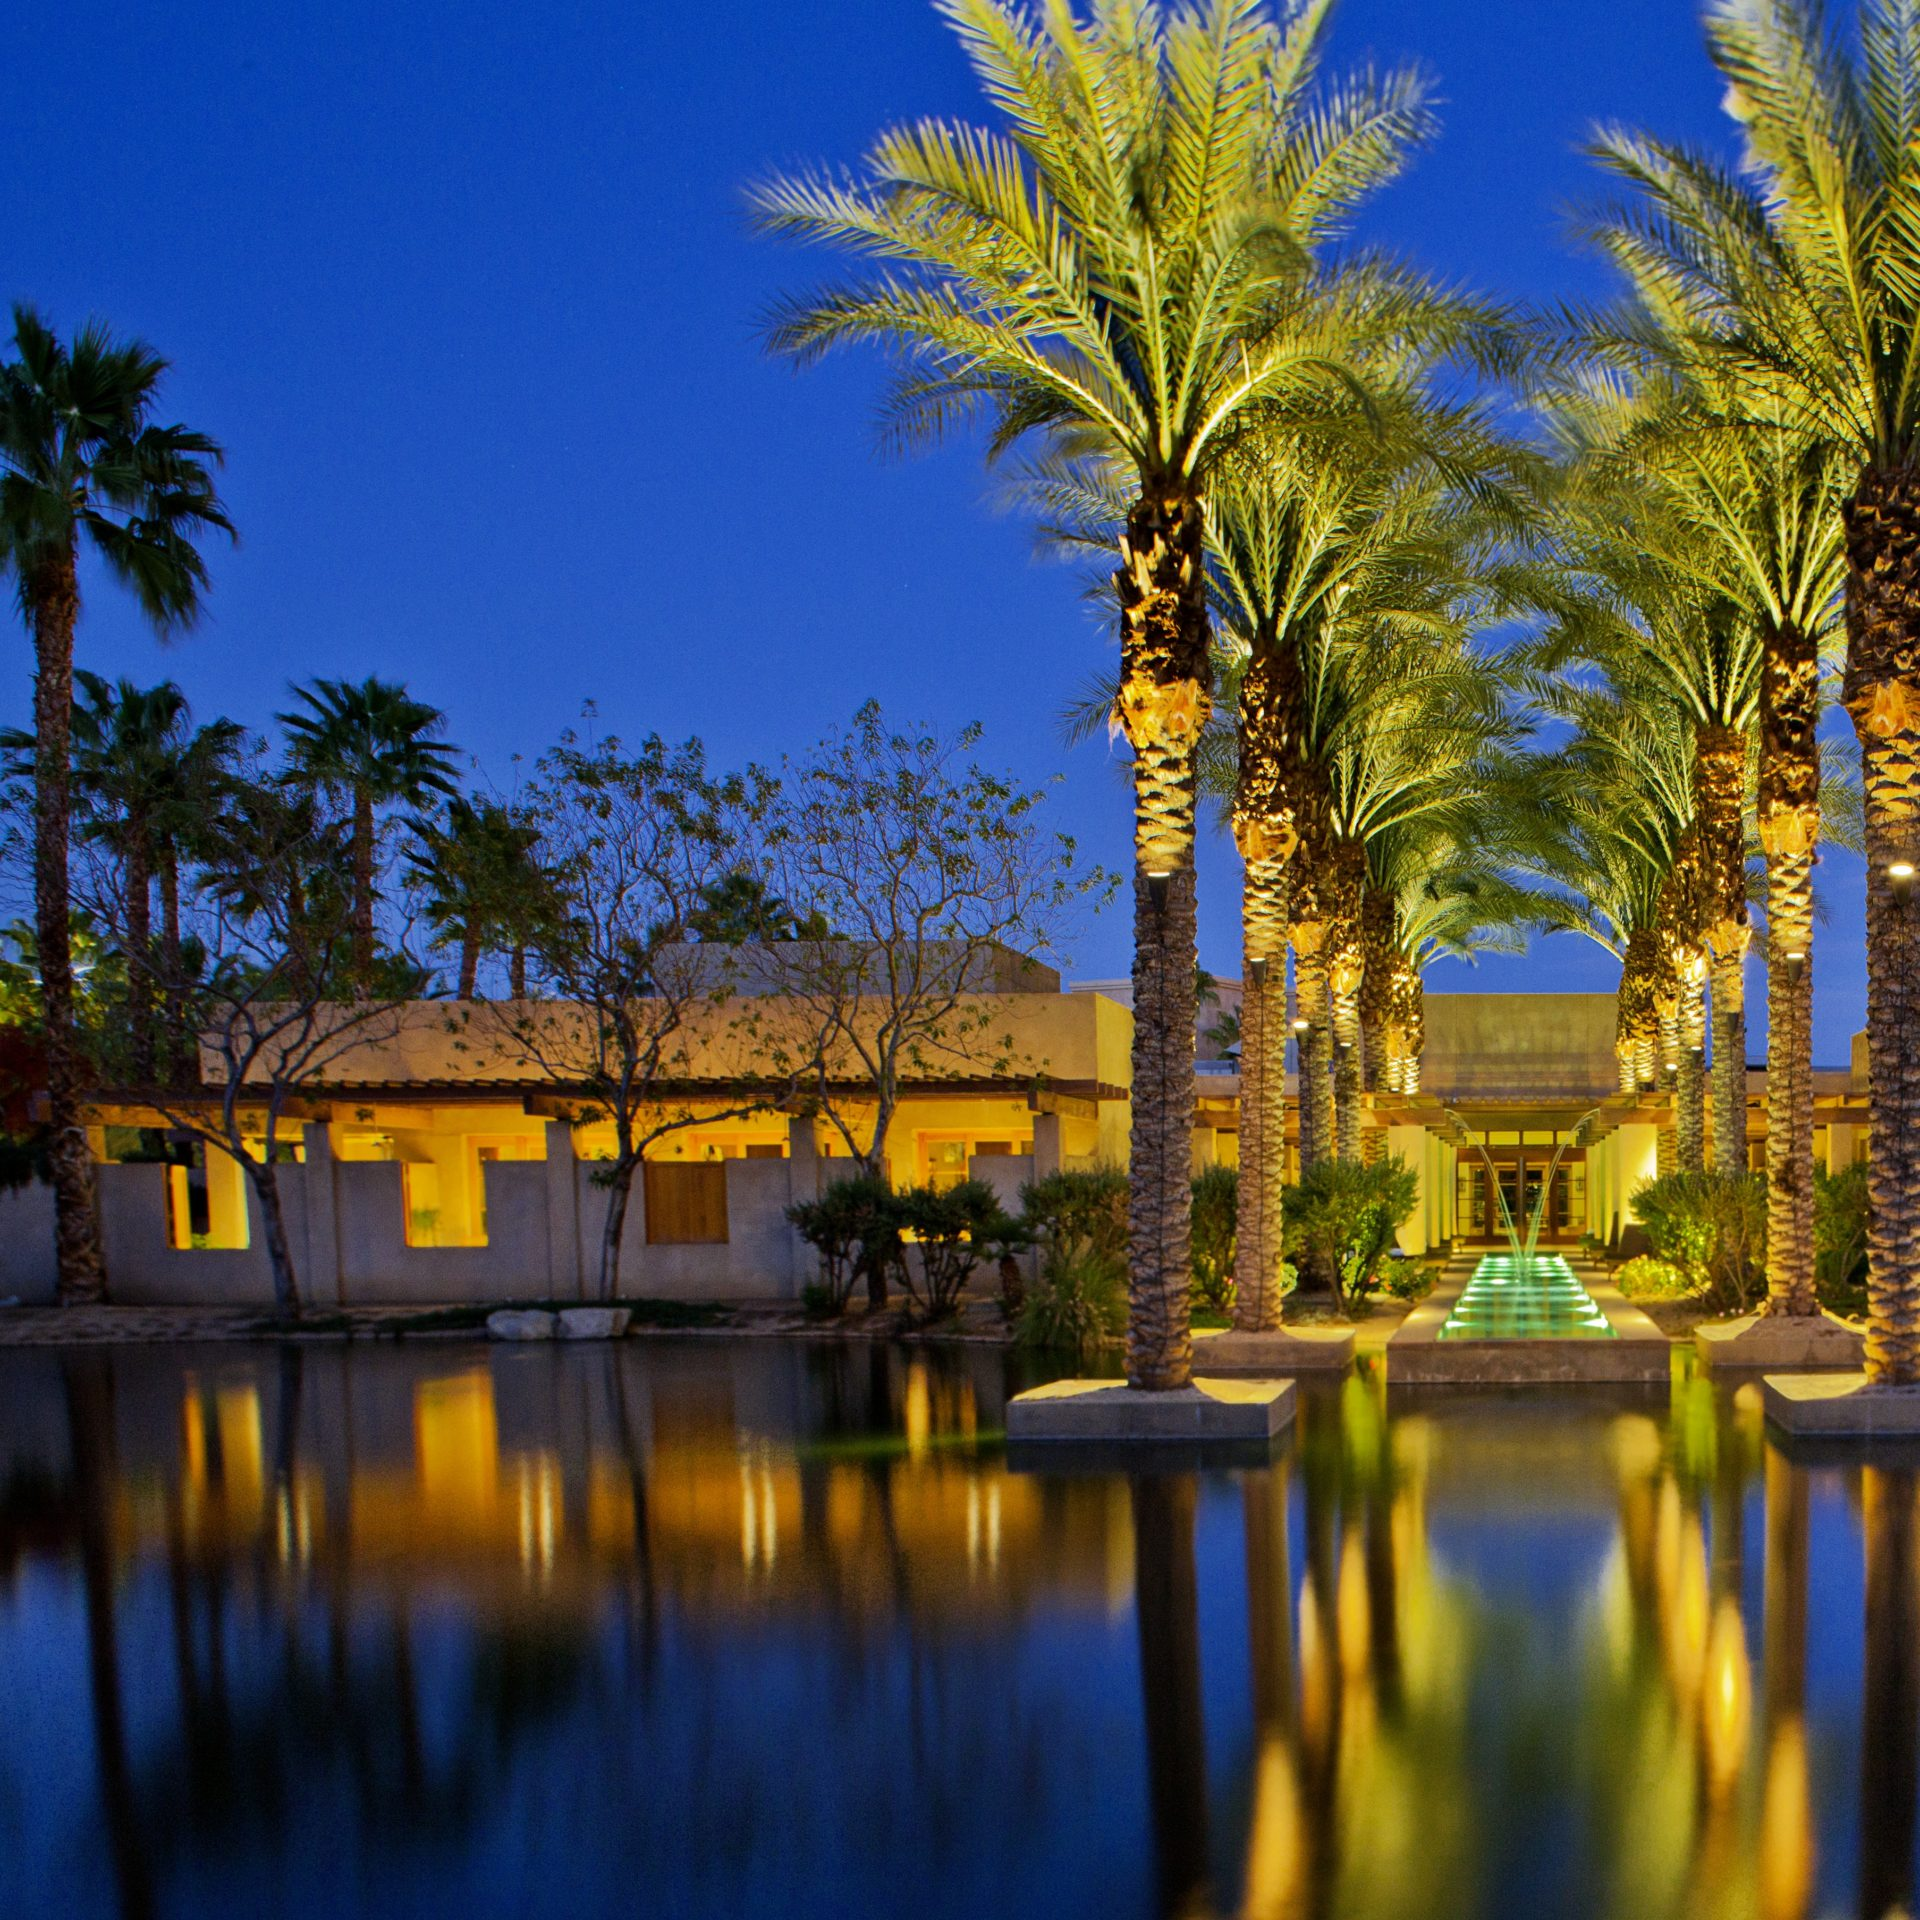 Hyatt Regency Indian Wells Resort